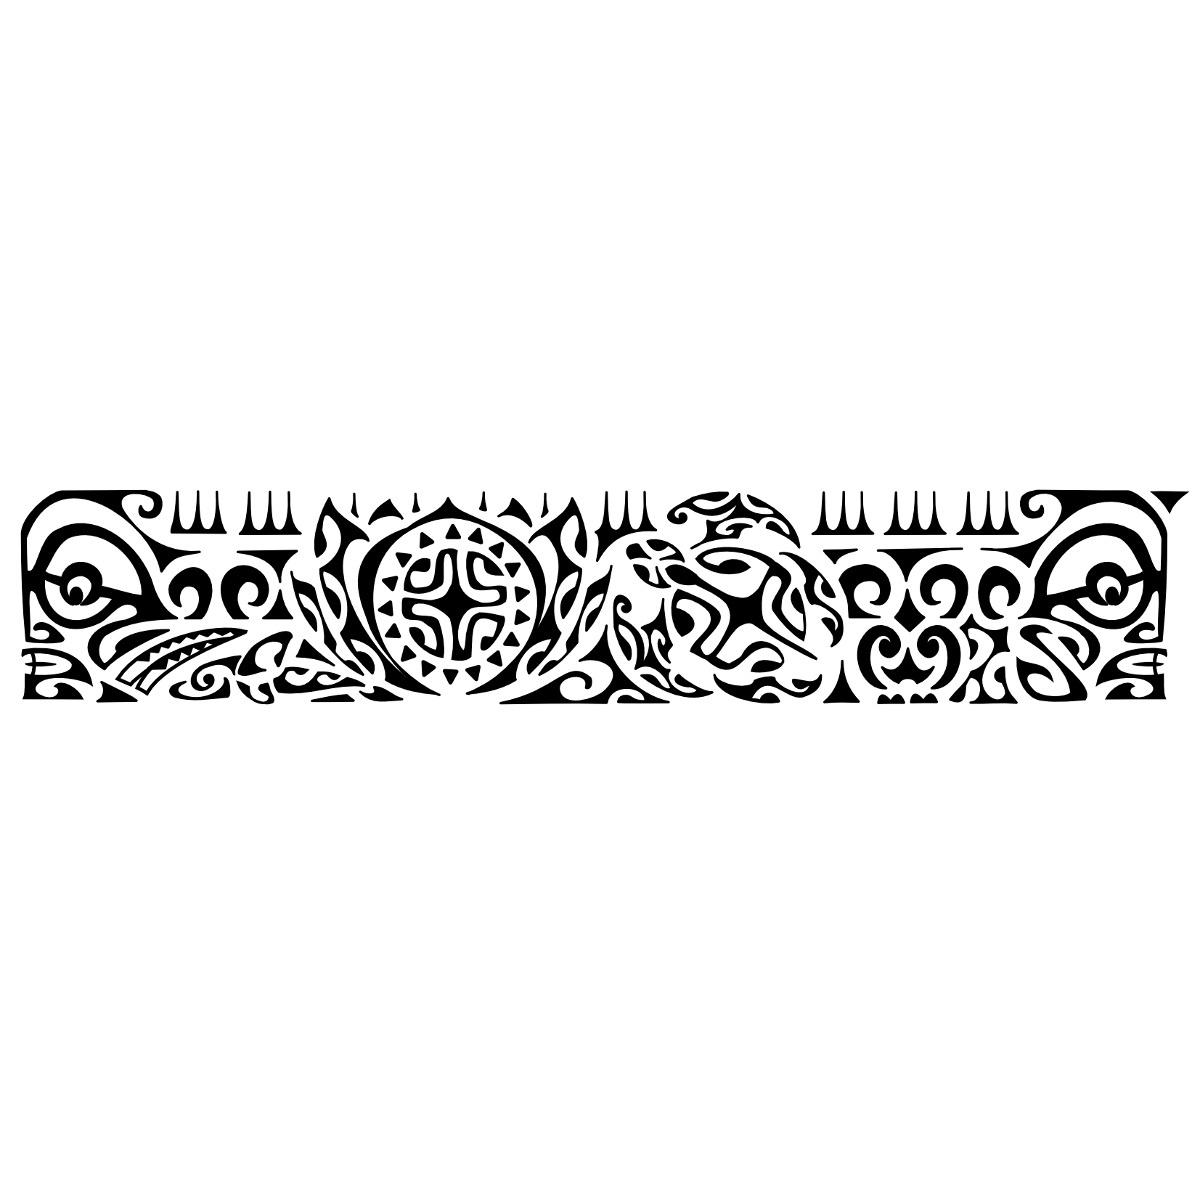 blu sky tattoo studio maori significato 23. Black Bedroom Furniture Sets. Home Design Ideas